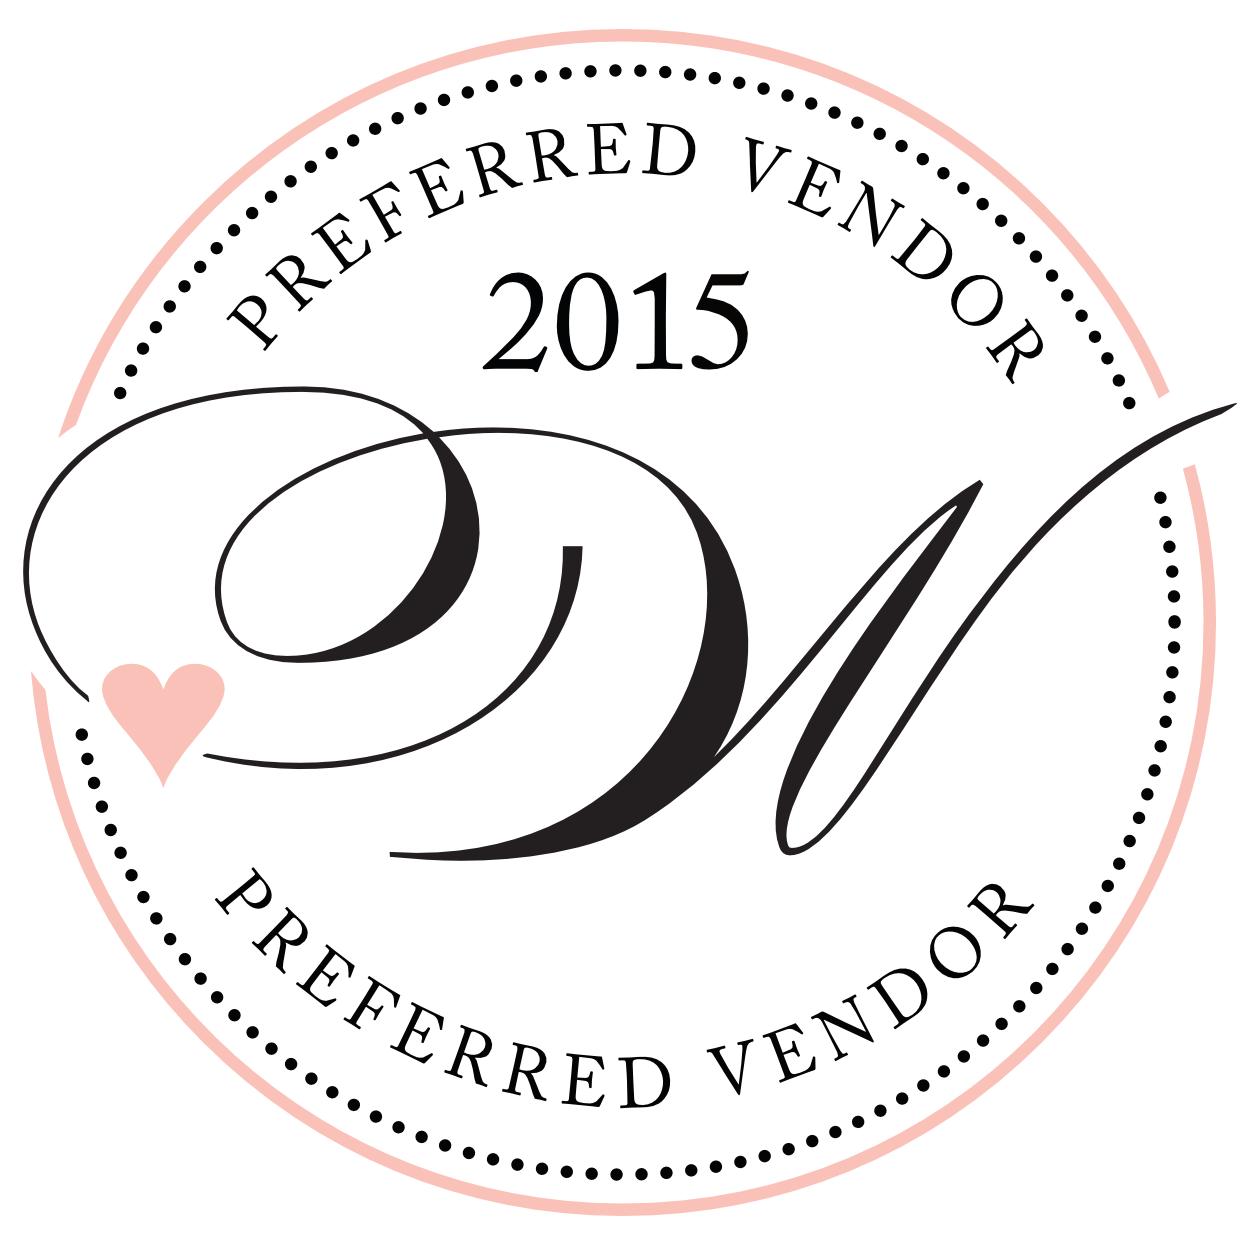 Preferred-Vendor-Badge-Final2015.png